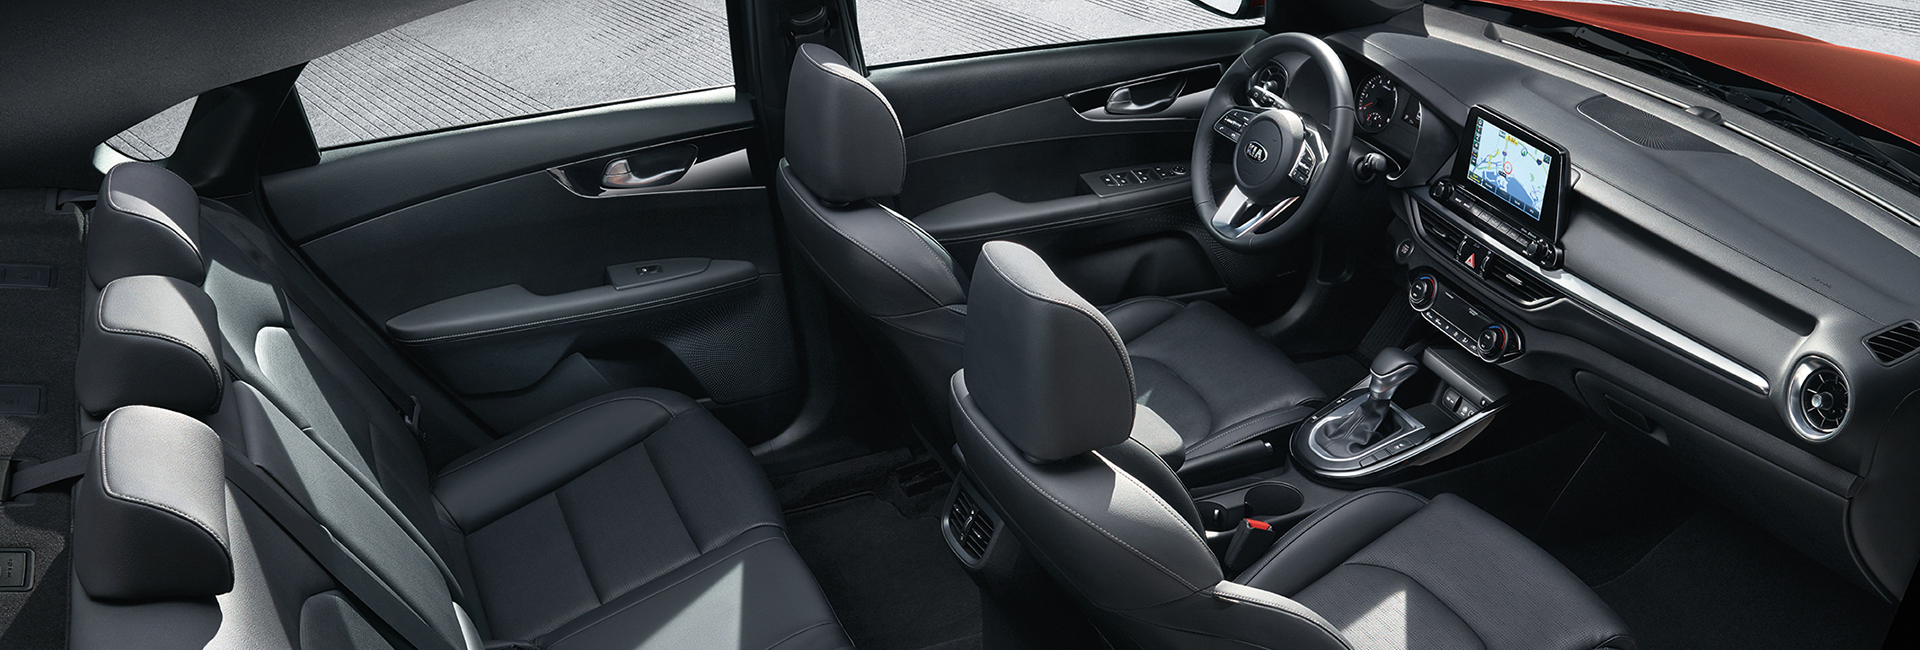 Interior image of the 2020 Kia Sportage